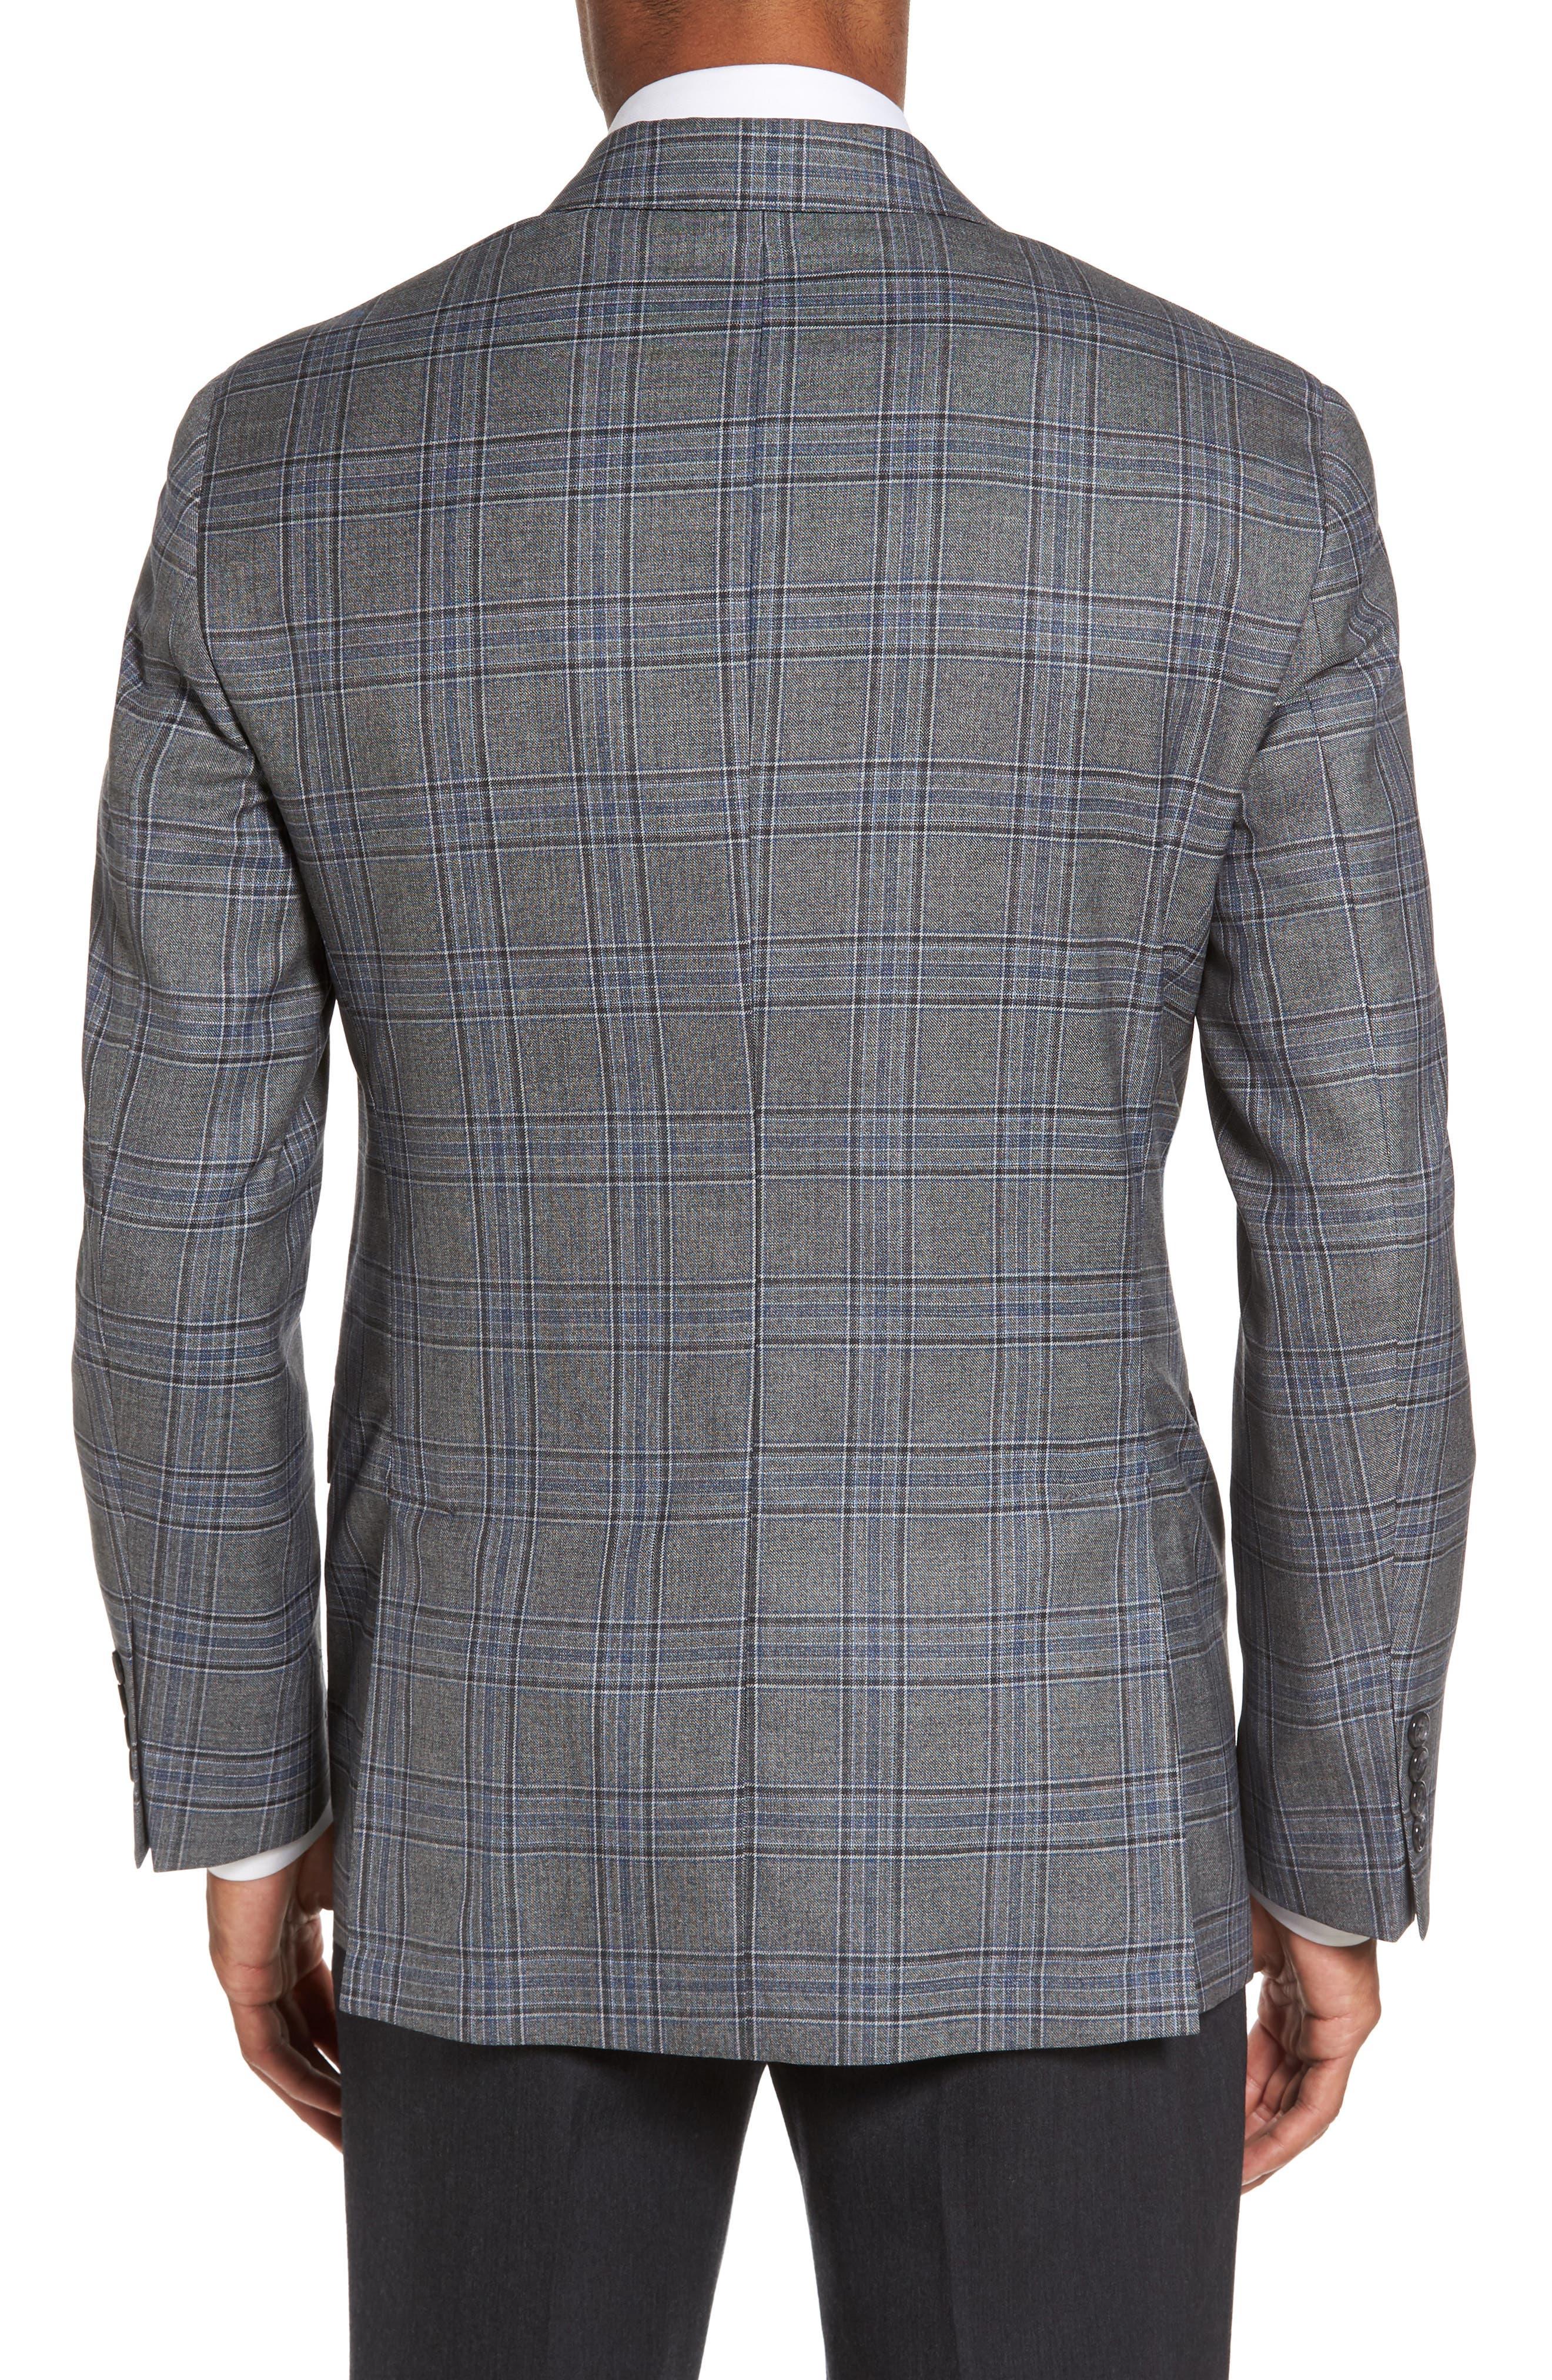 Alternate Image 2  - Todd Snyder White Label Trim Fit Plaid Wool Sport Coat